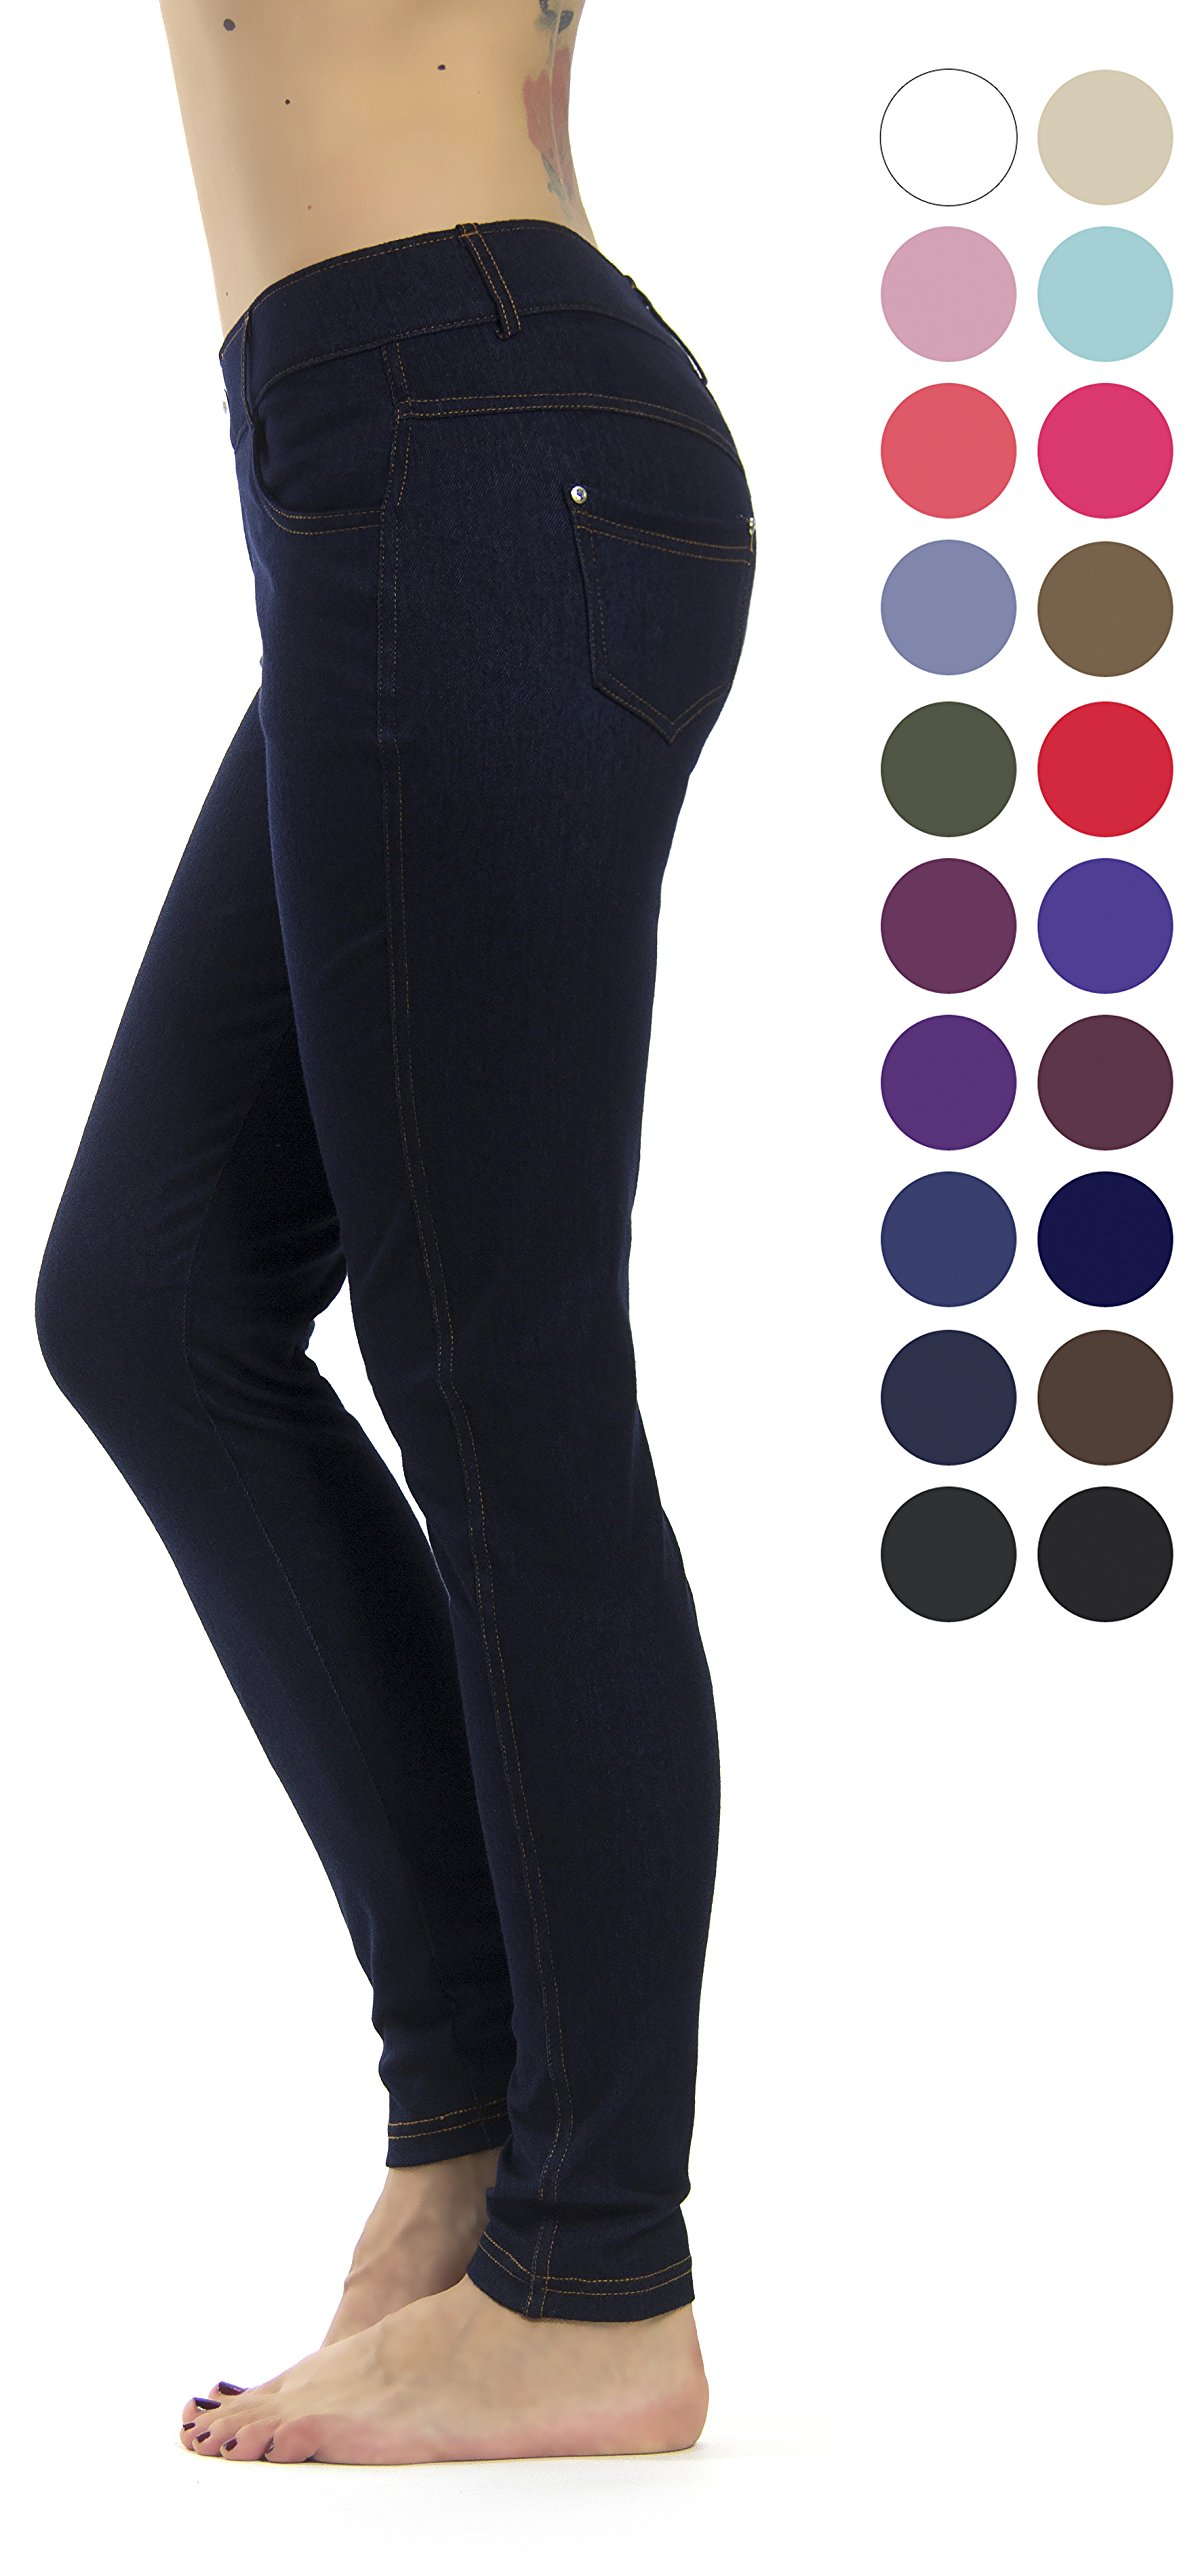 Prolific Health Women's Jean Look Jeggings Tights Slimming Many Colors Spandex Leggings Pants S-XXXL (Large/X-Large, Blue Denim)